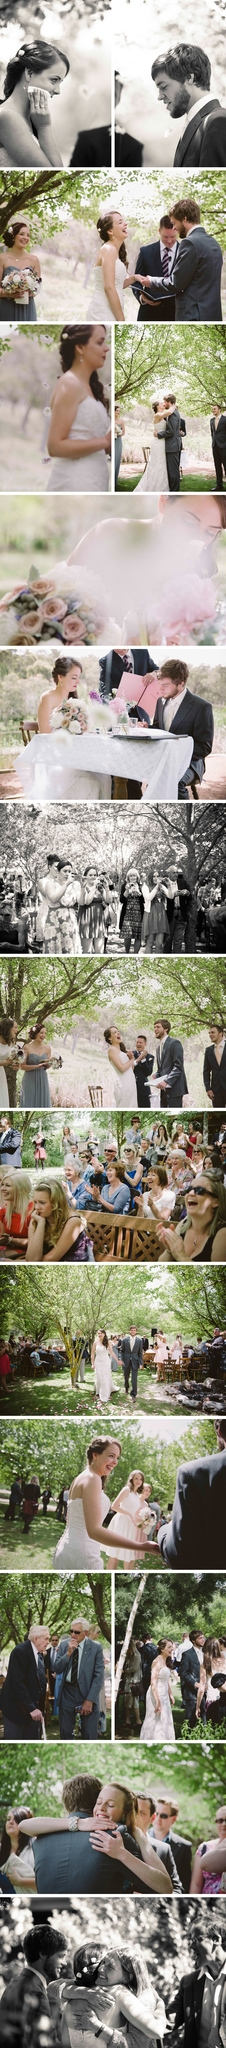 DIY Rustic Redbrow Garden Wedding Photos